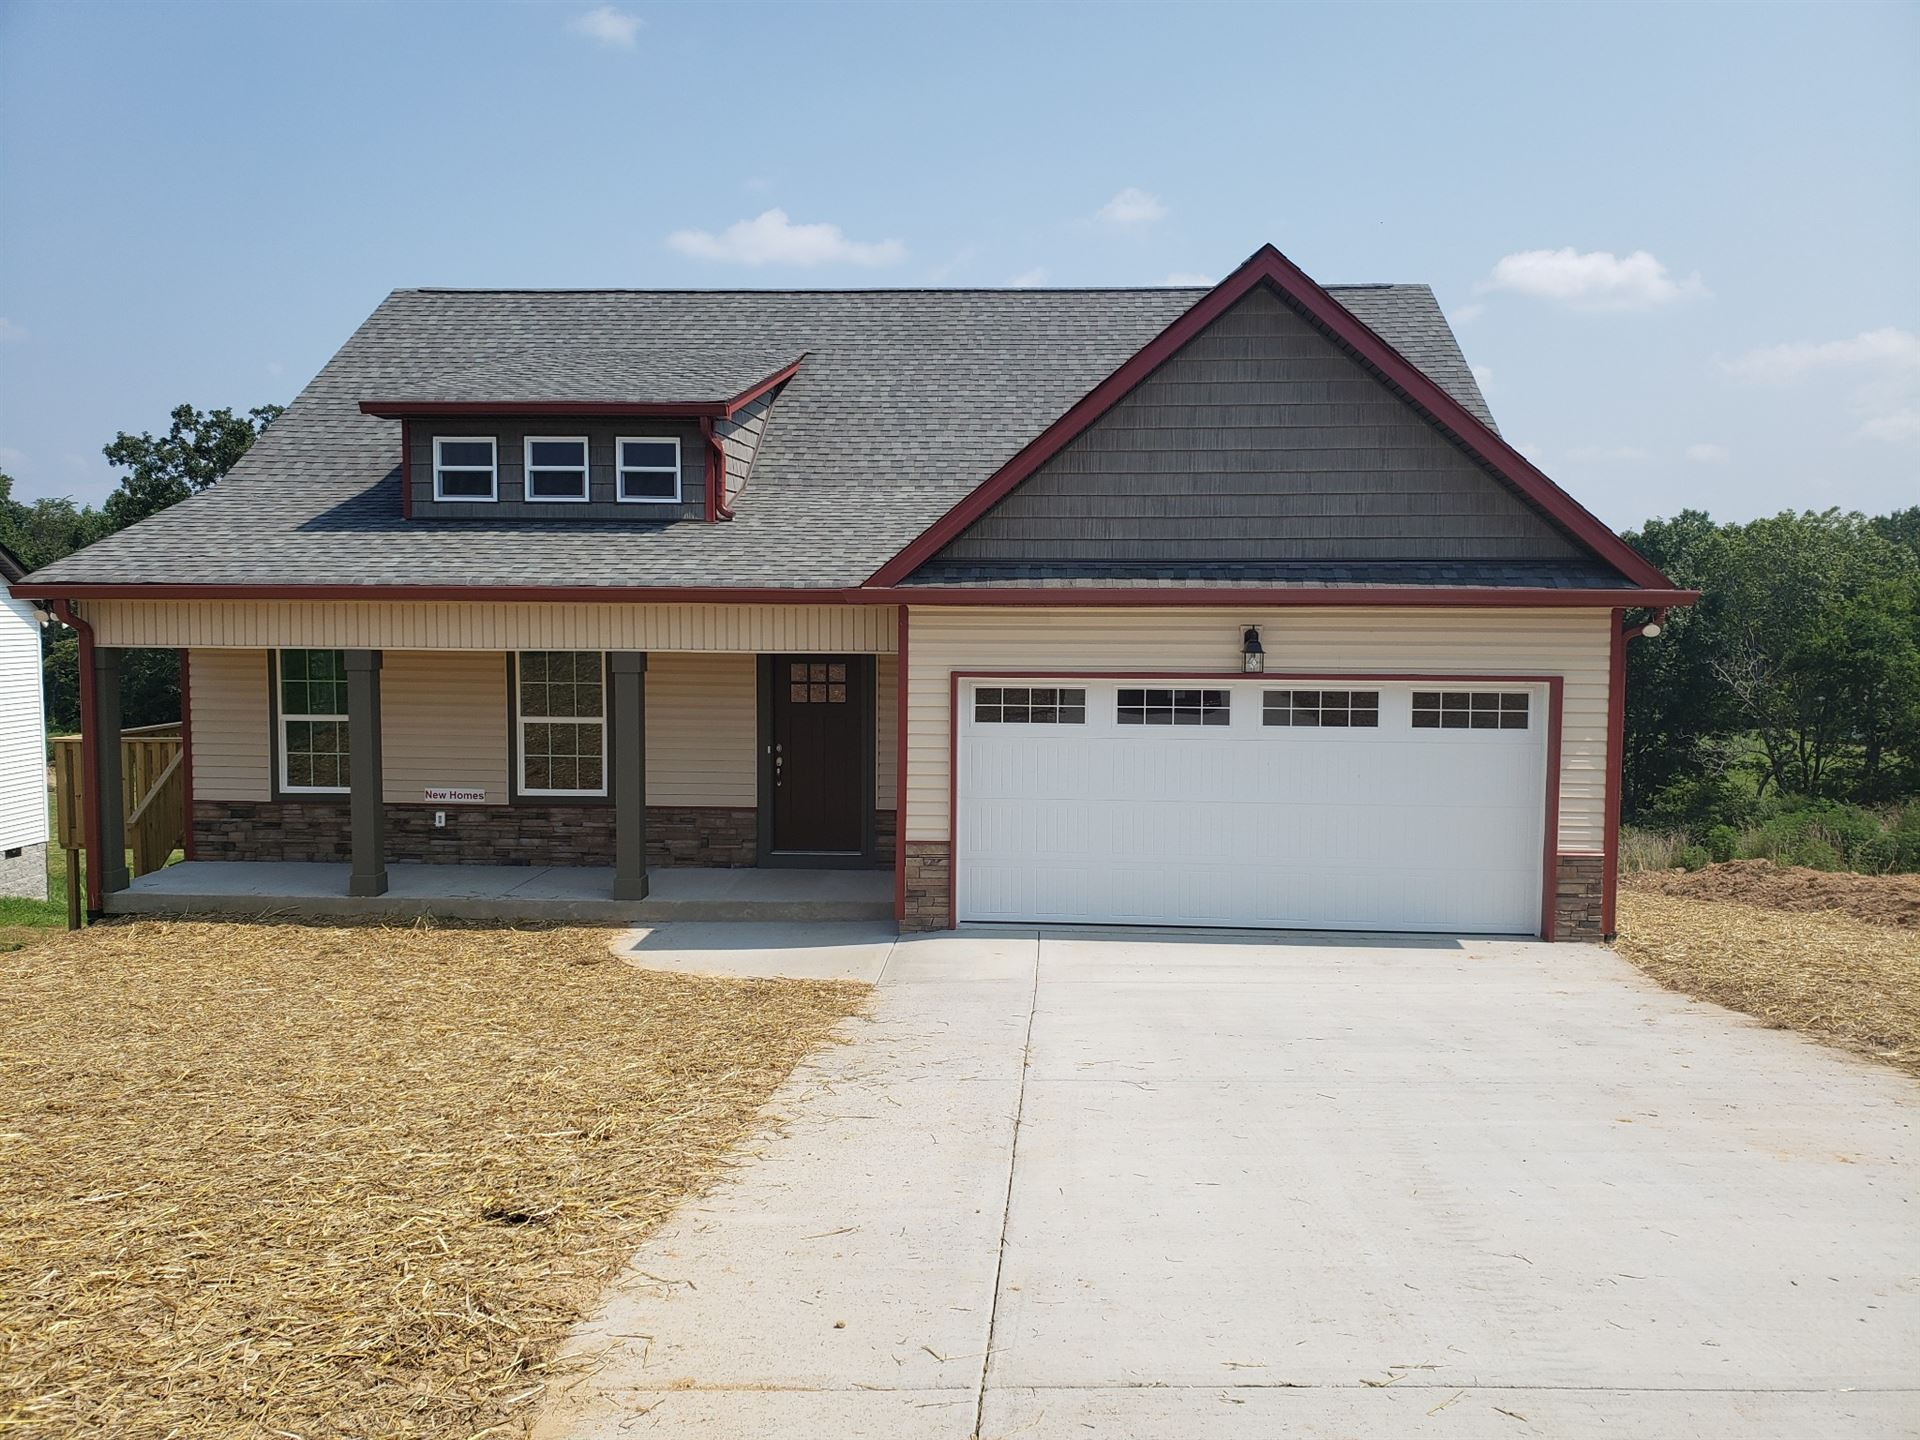 1354 Taylor Town Rd, White Bluff, TN 37187 - MLS#: 2275331